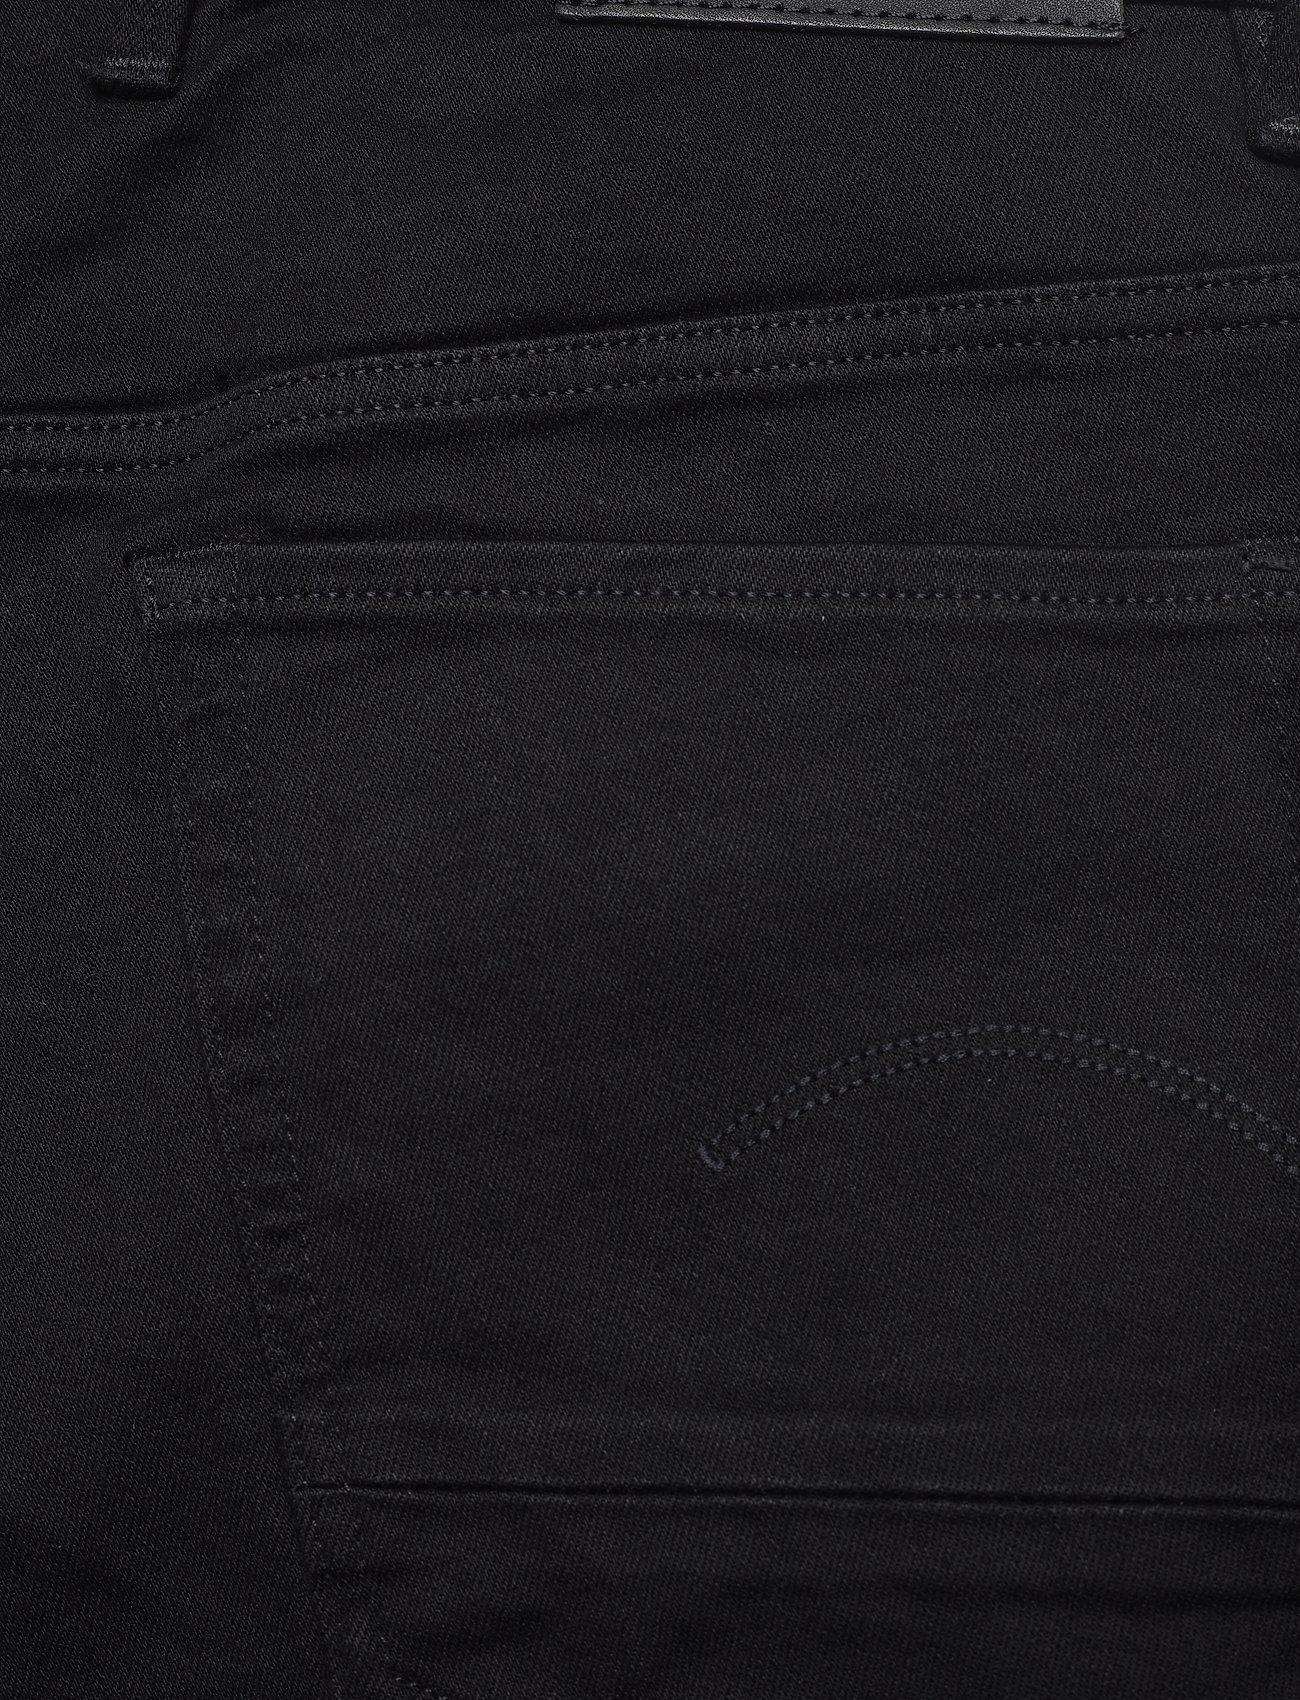 G-star RAW - Kafey Ultra High Skinny Wmn - skinny jeans - pitch black - 4